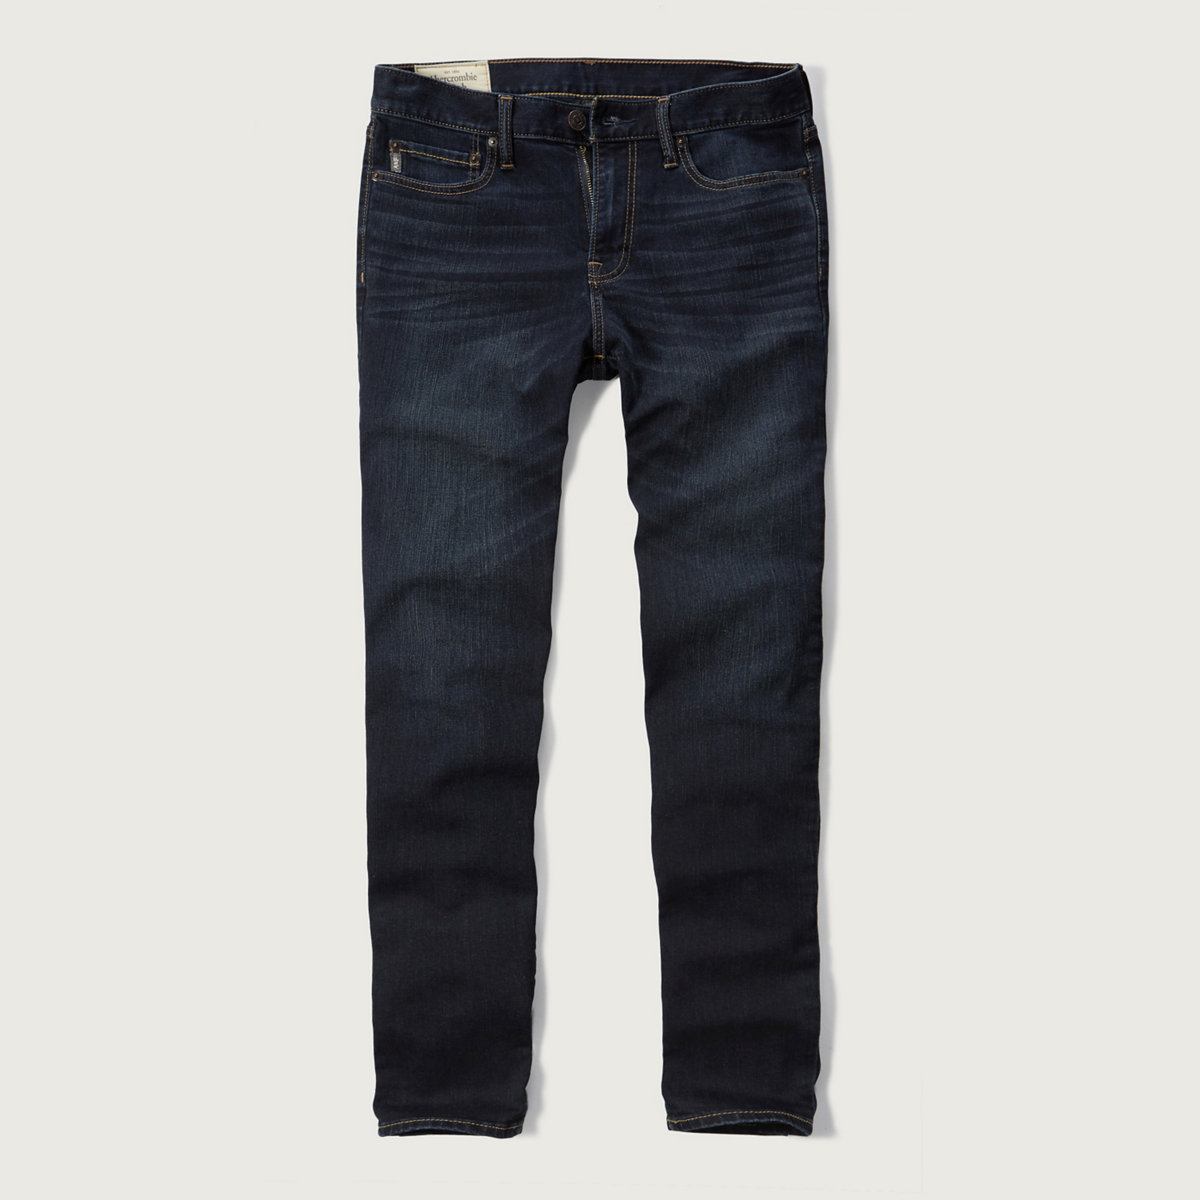 Super Skinny Lightweight Stretch Jeans